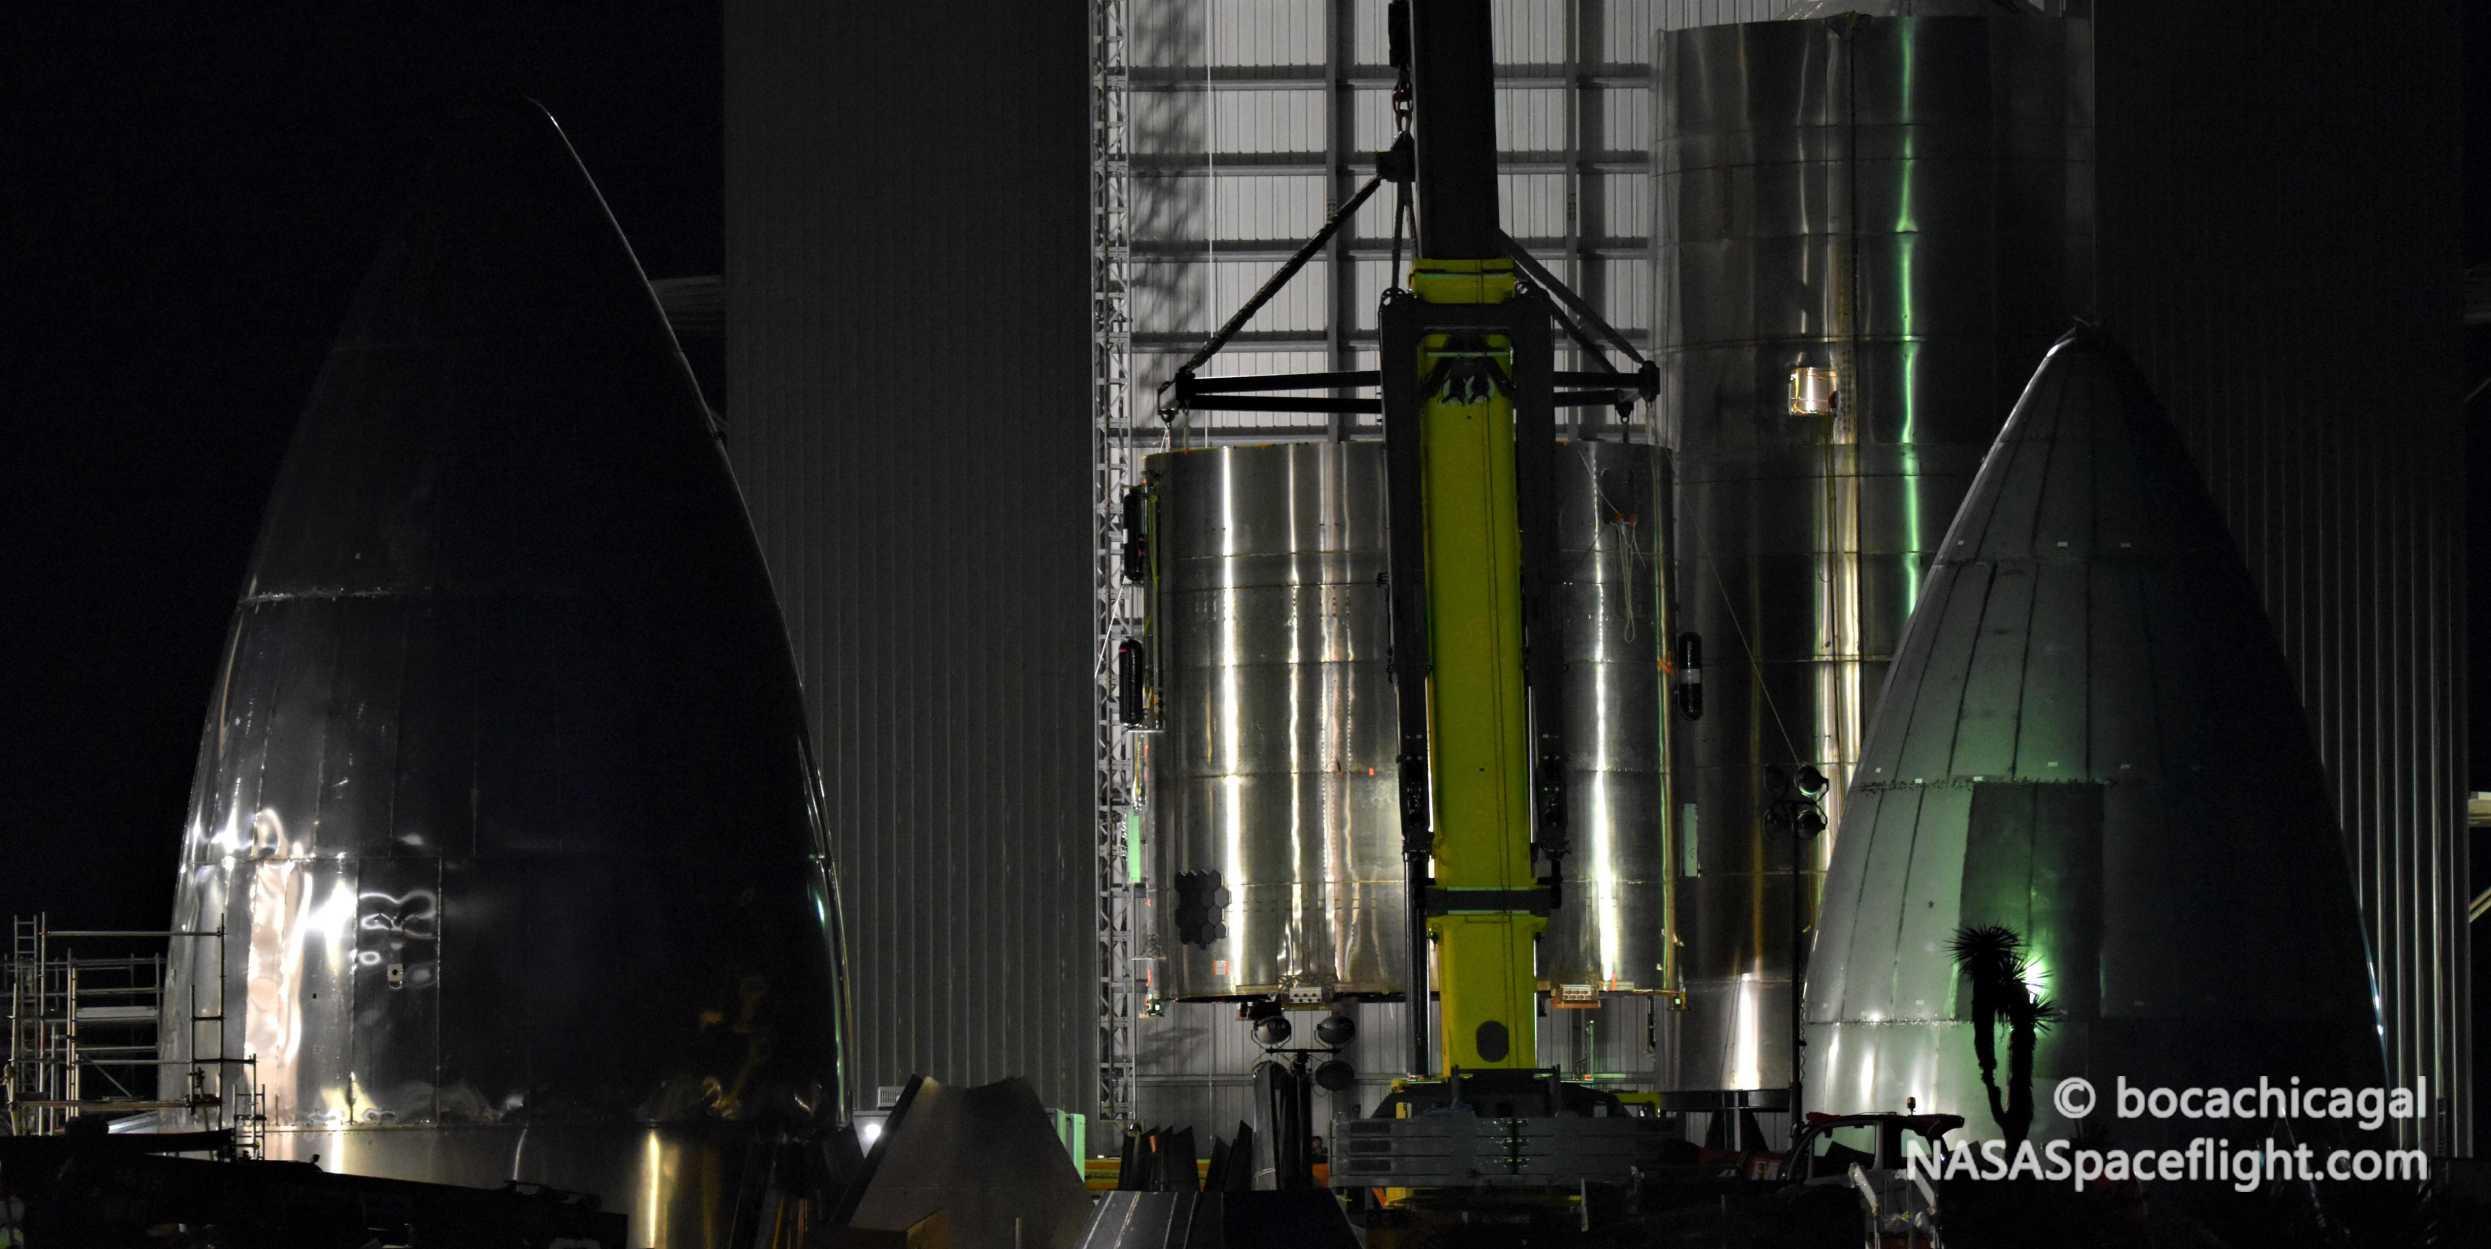 Starship Boca Chica 051120 (NASASpaceflight – bocachicagal) SN5 engine section move 5 crop (c)